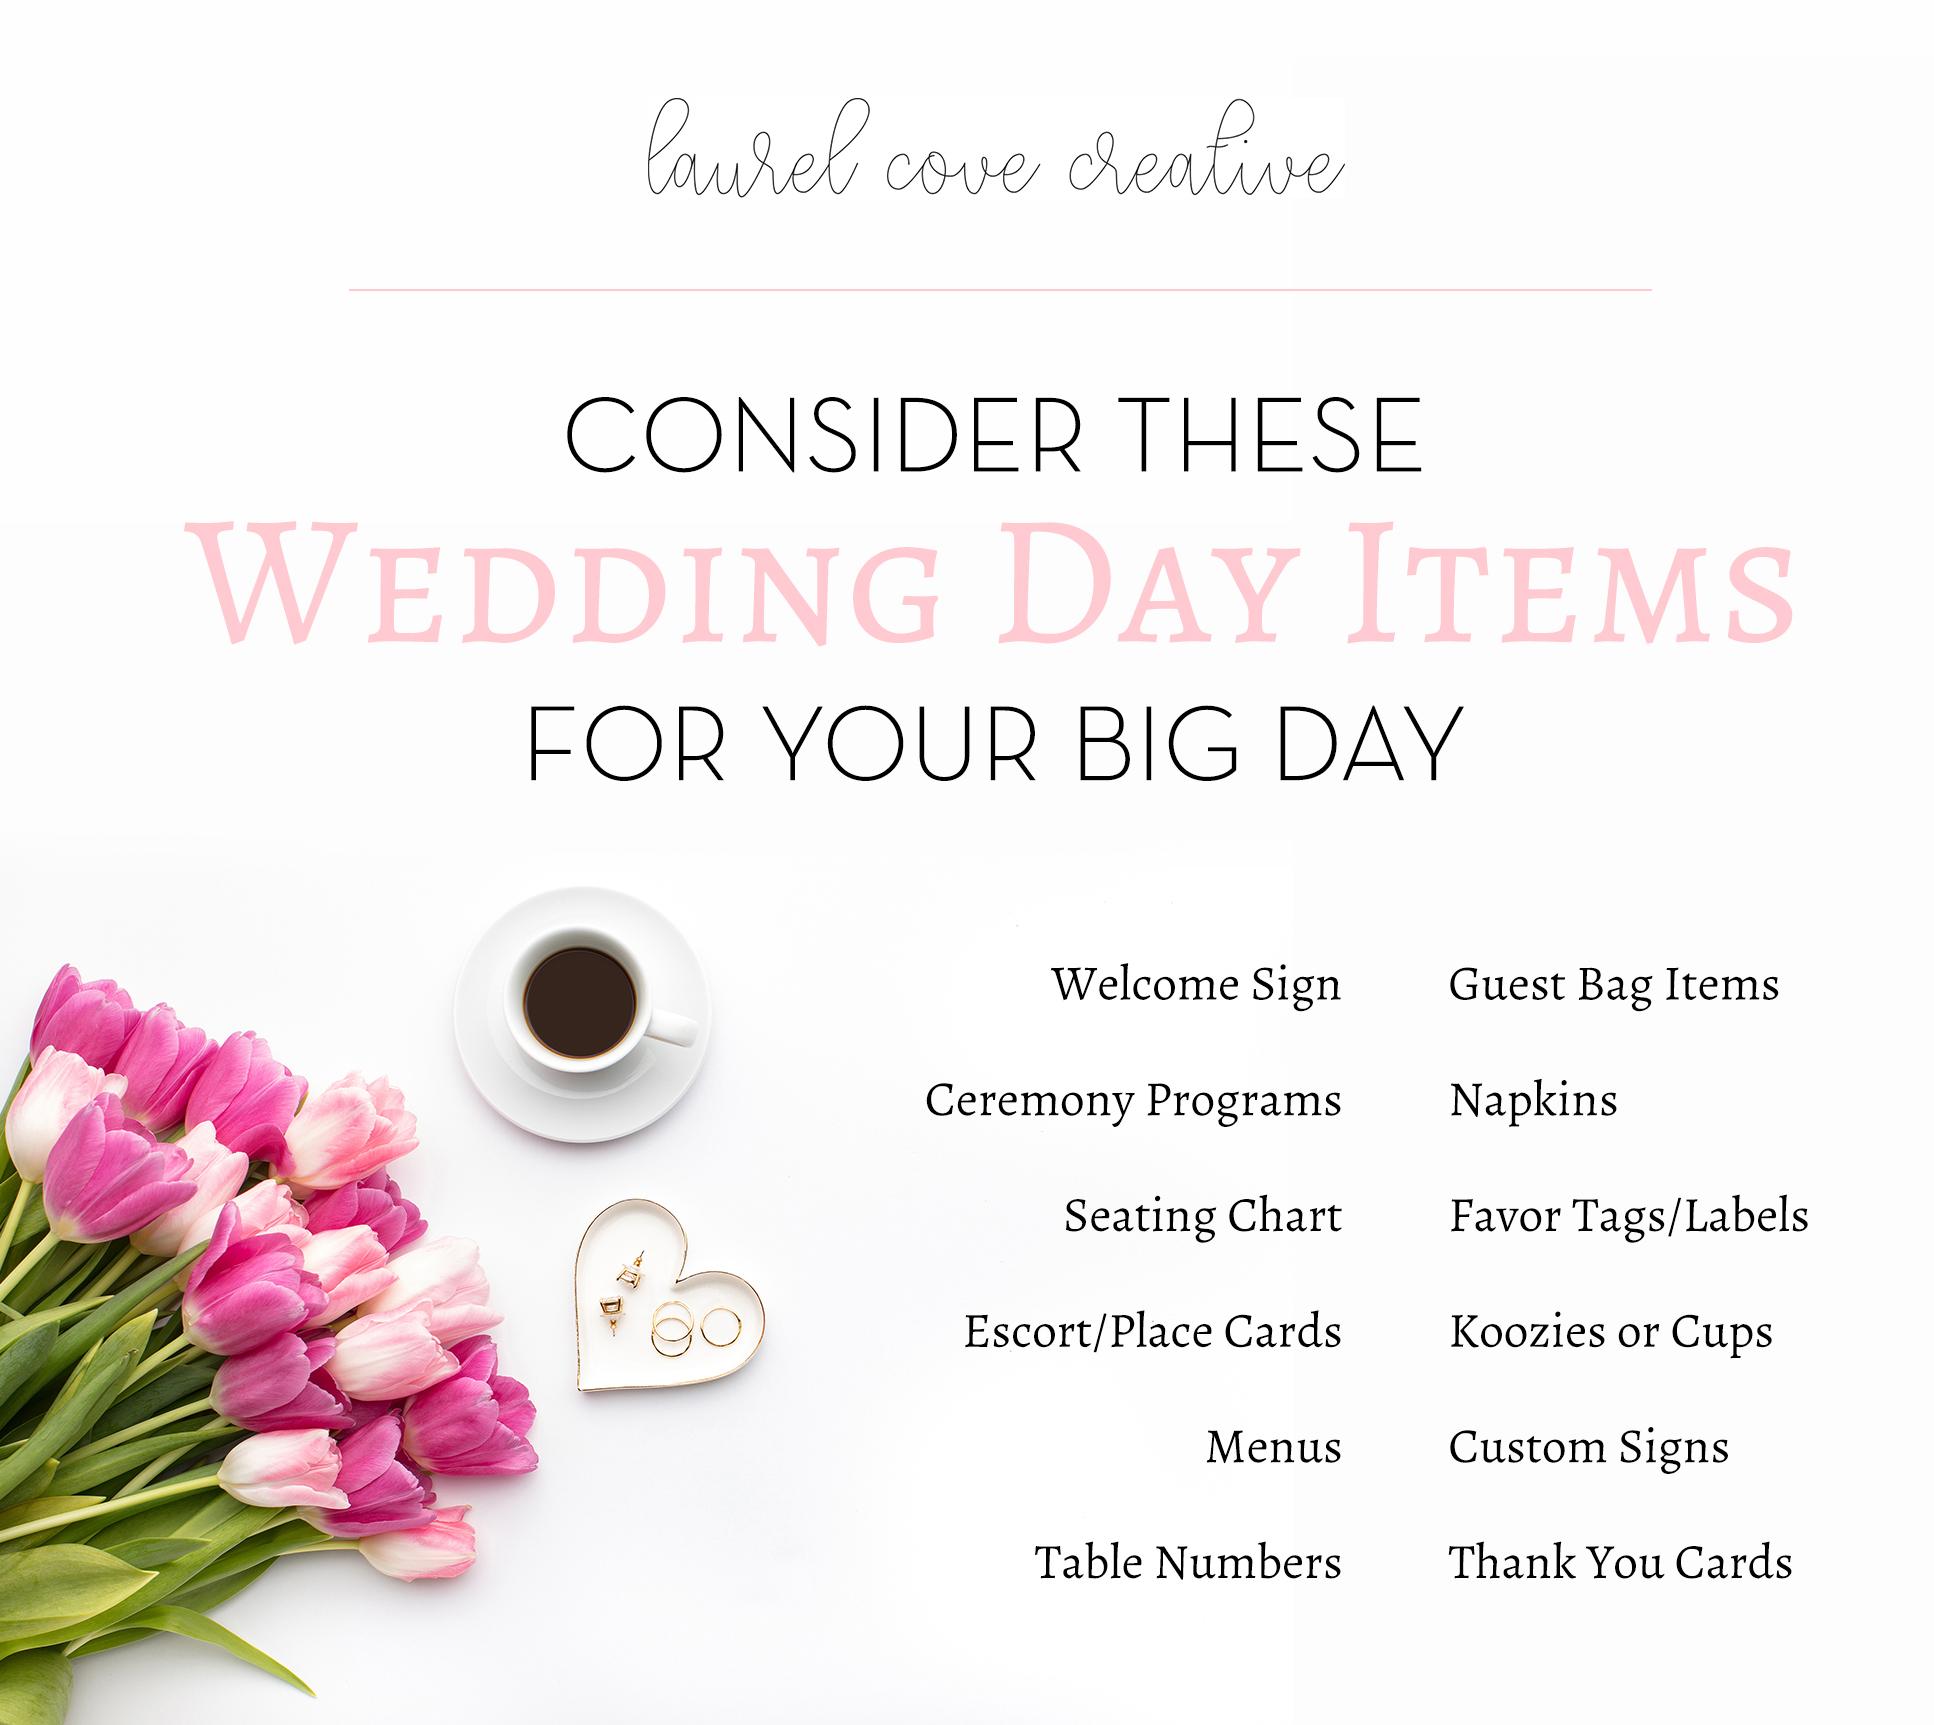 WeddingDayItems.jpg